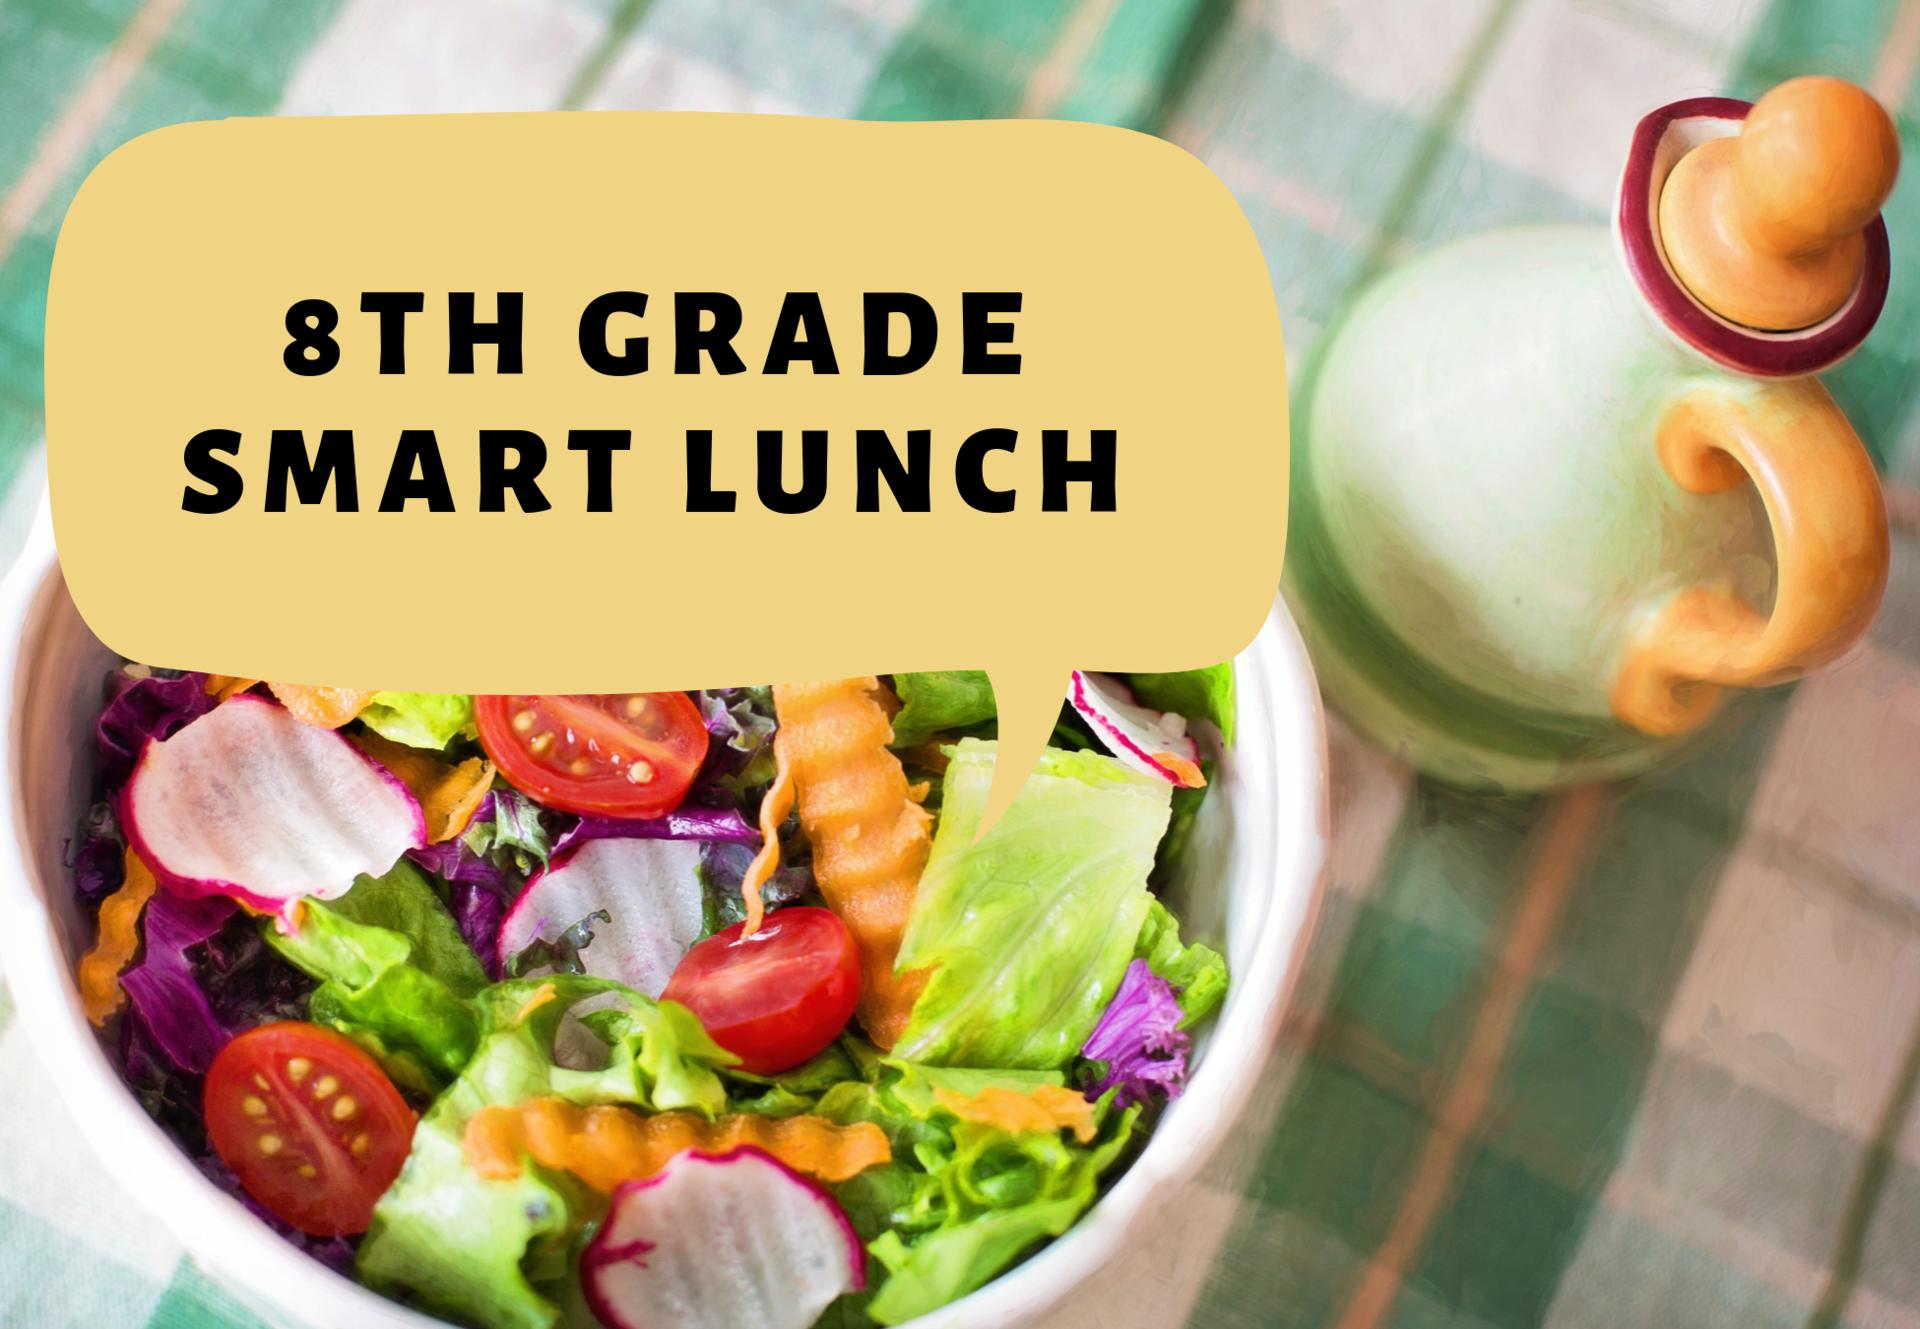 8th grade smart lunch